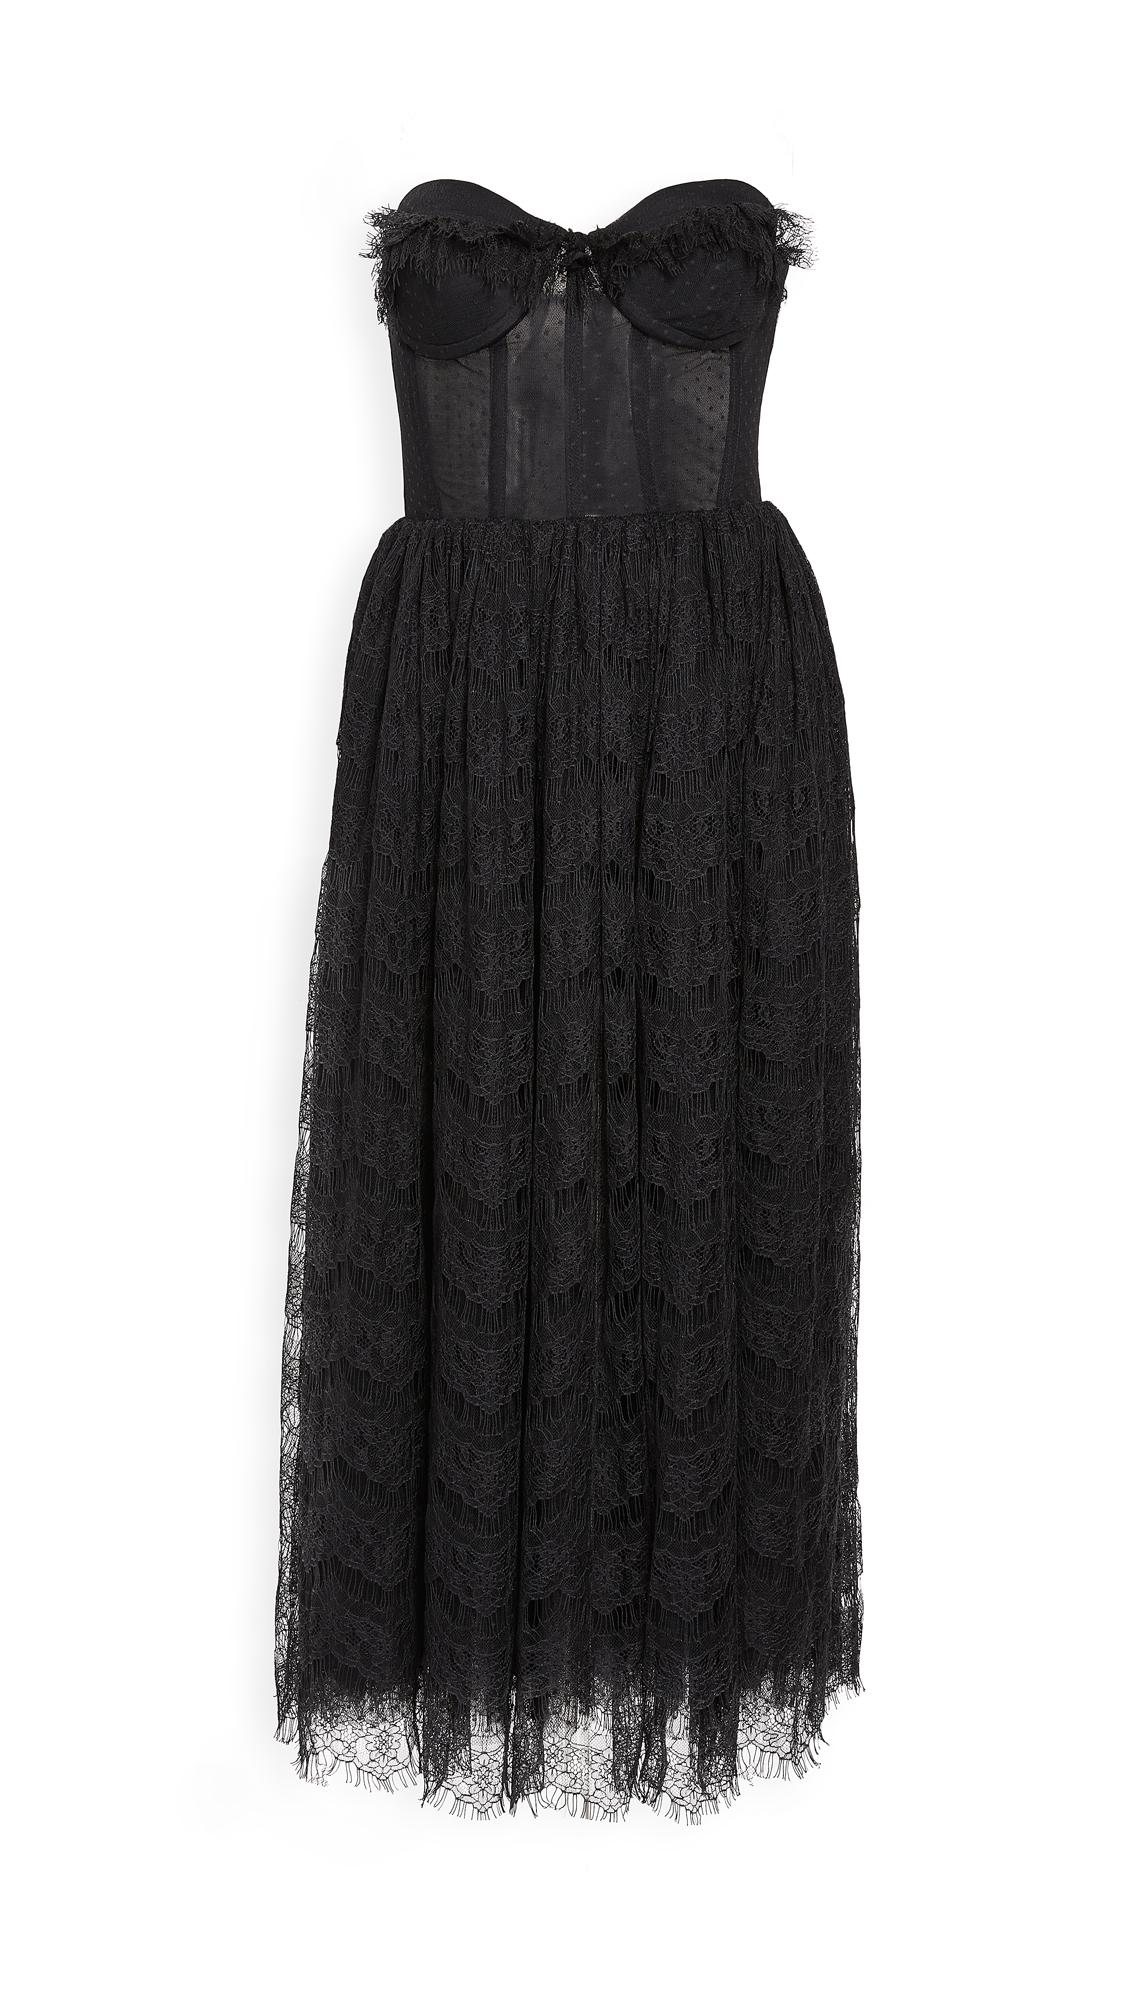 Silvia Astore Irina Pleated Dress - 30% Off Sale